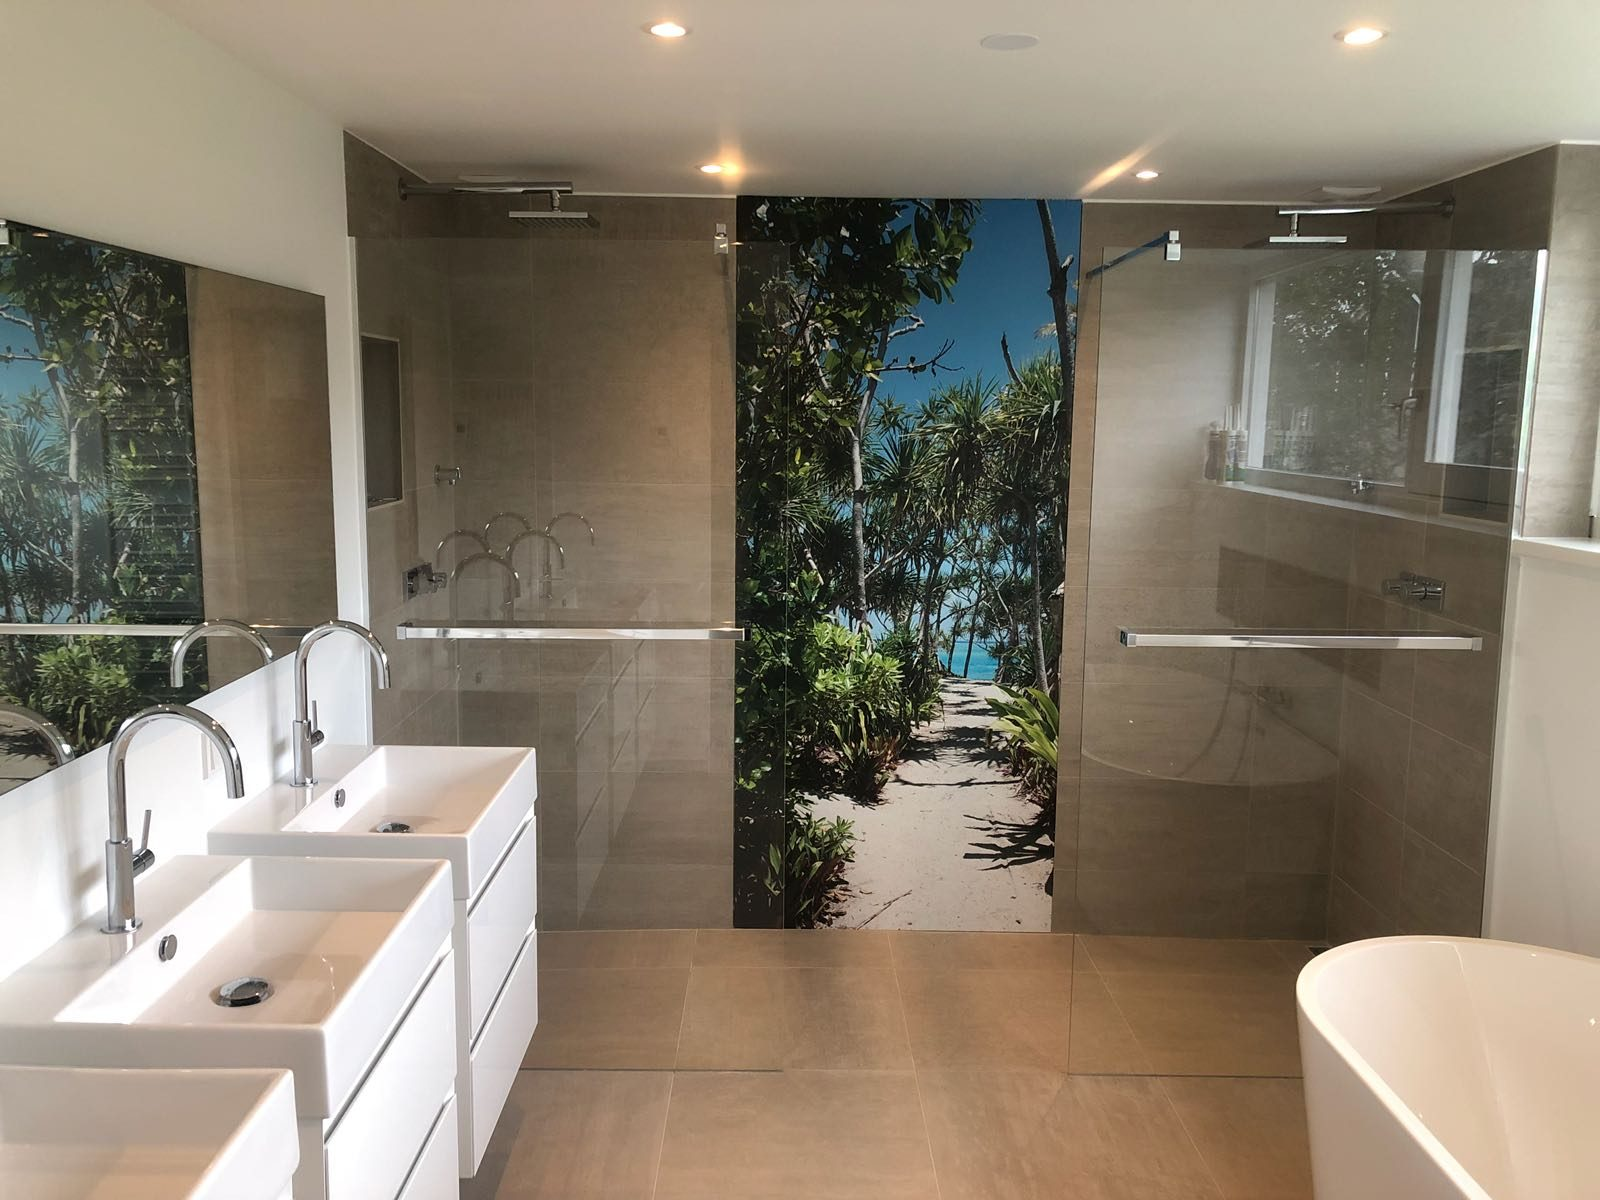 Badkamer project van badkamerhuis